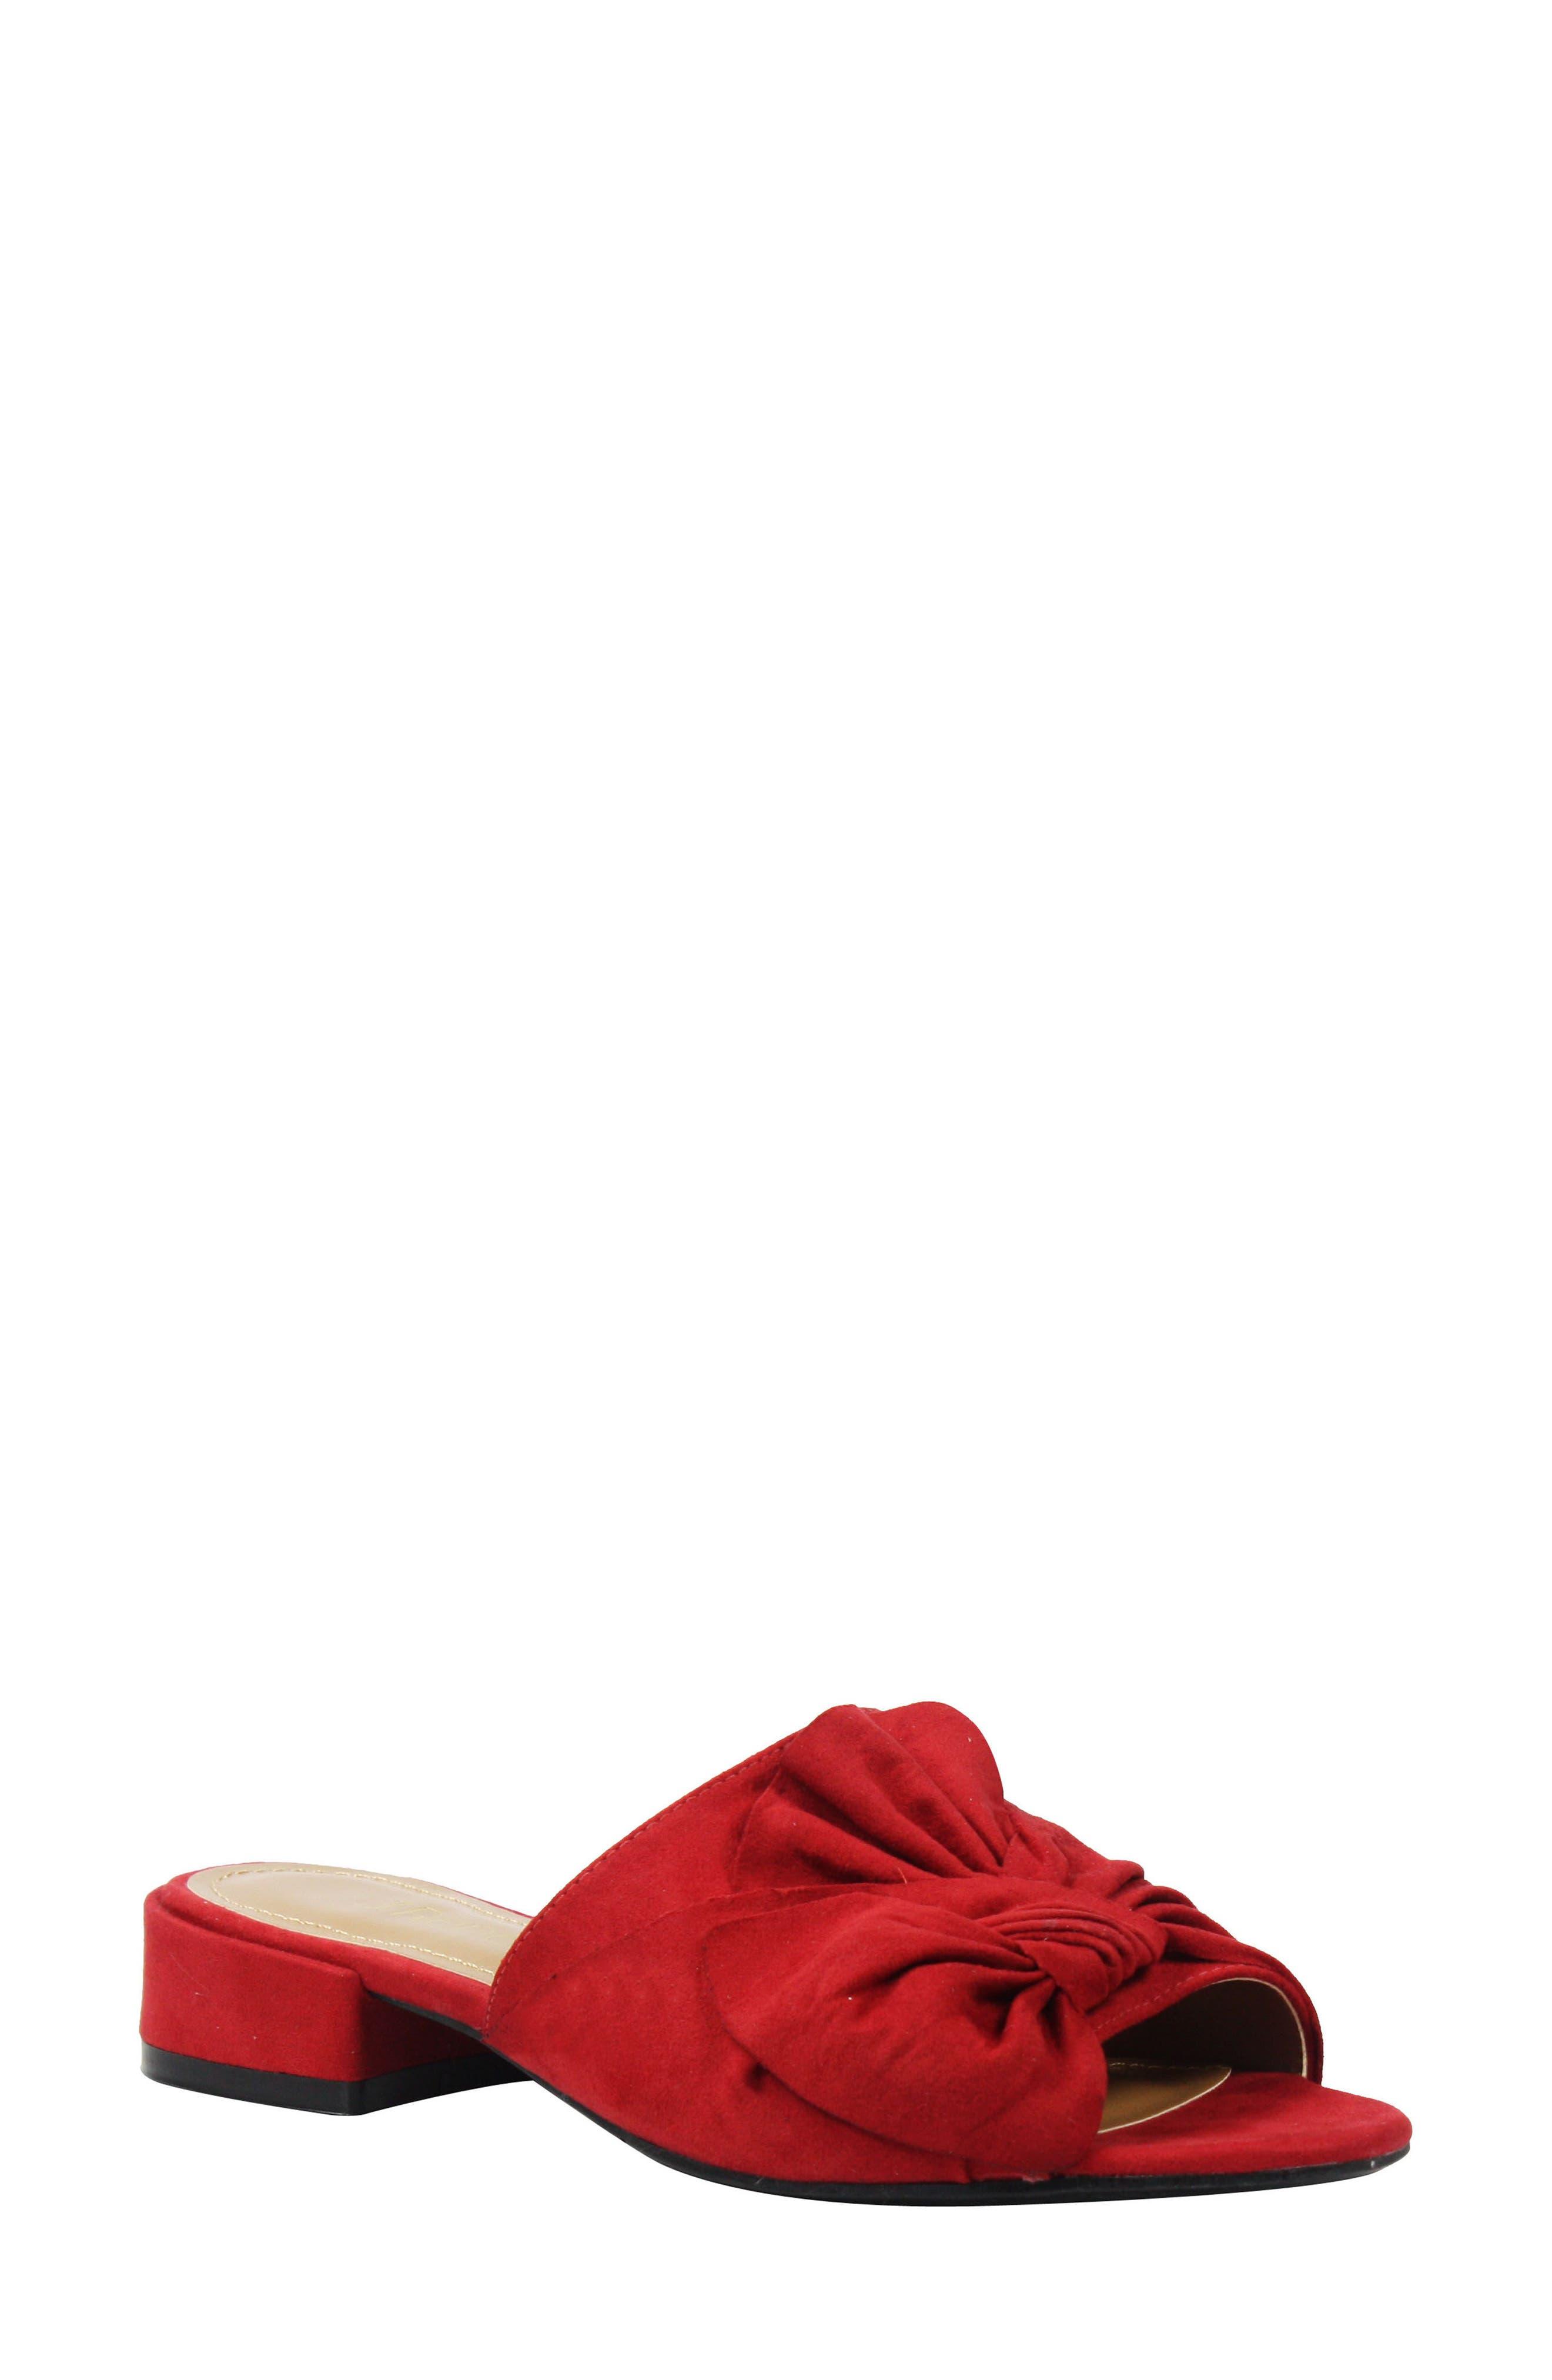 Sattuck Slide Sandal,                         Main,                         color, Red Fabric